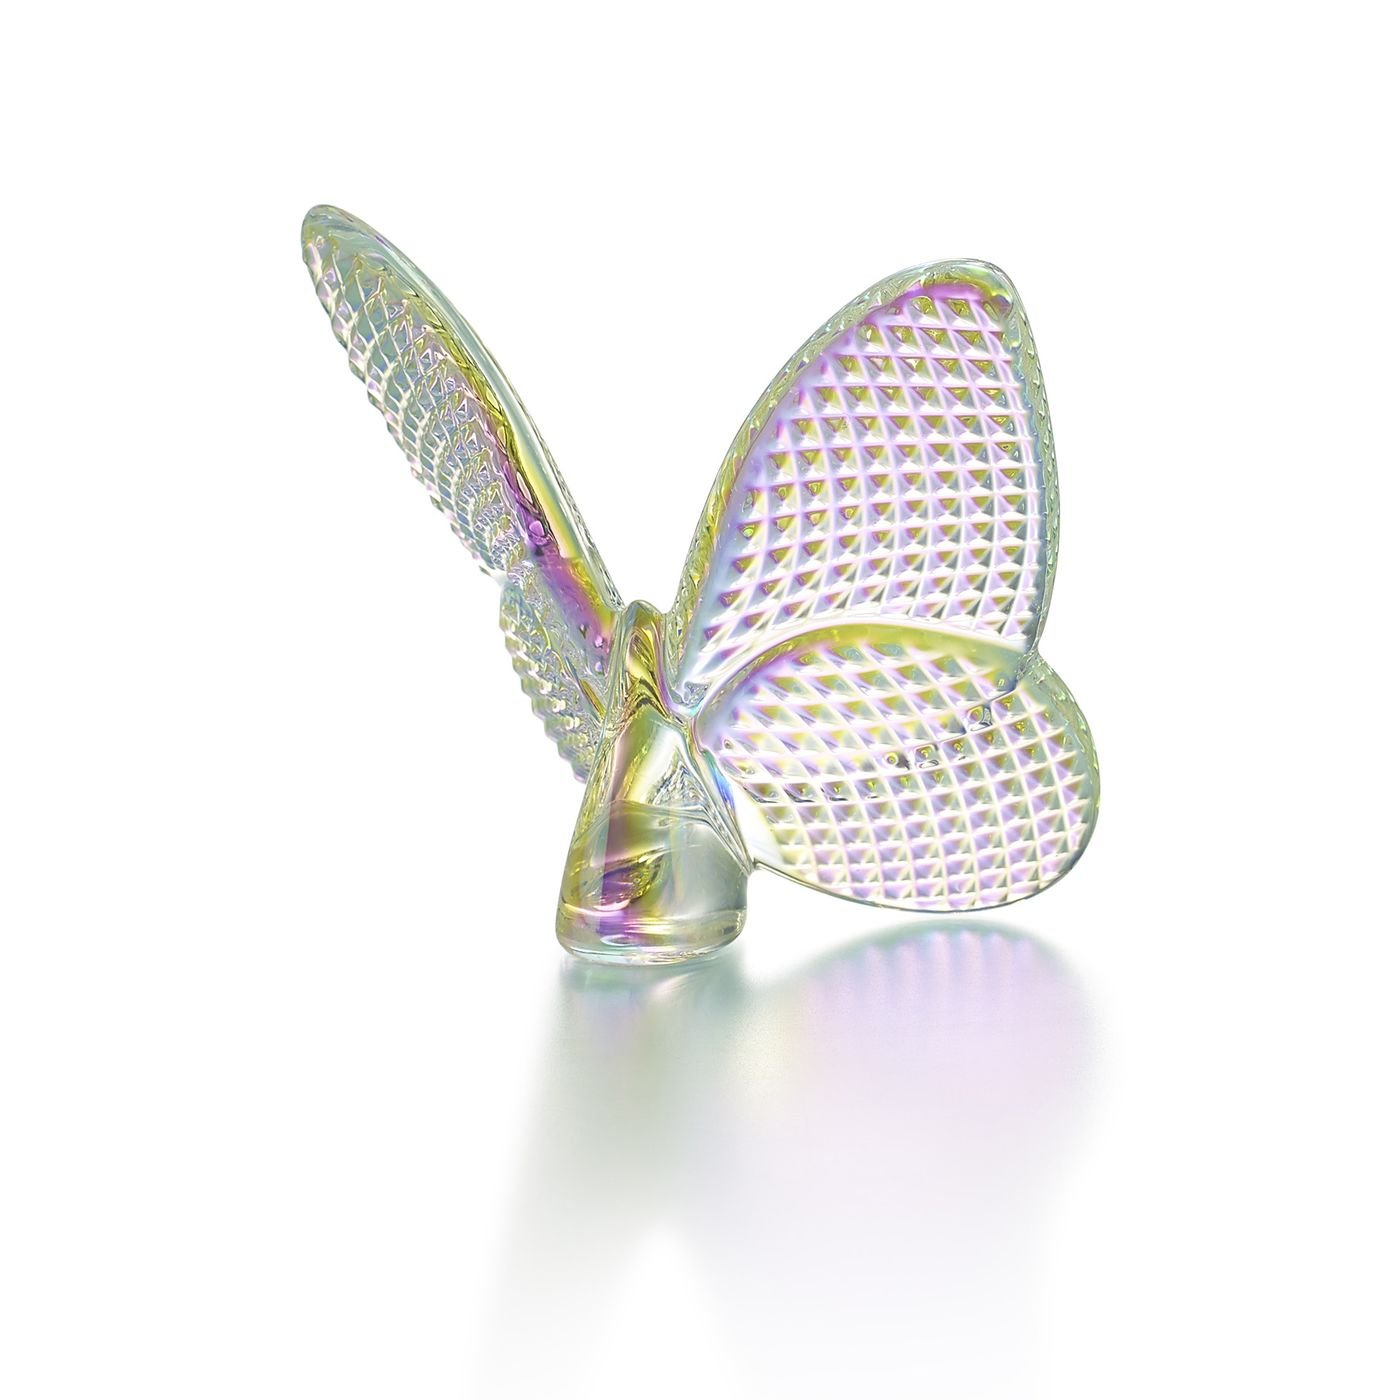 Baccarat Cystal Butterfly Diamond Pattern Iridescent